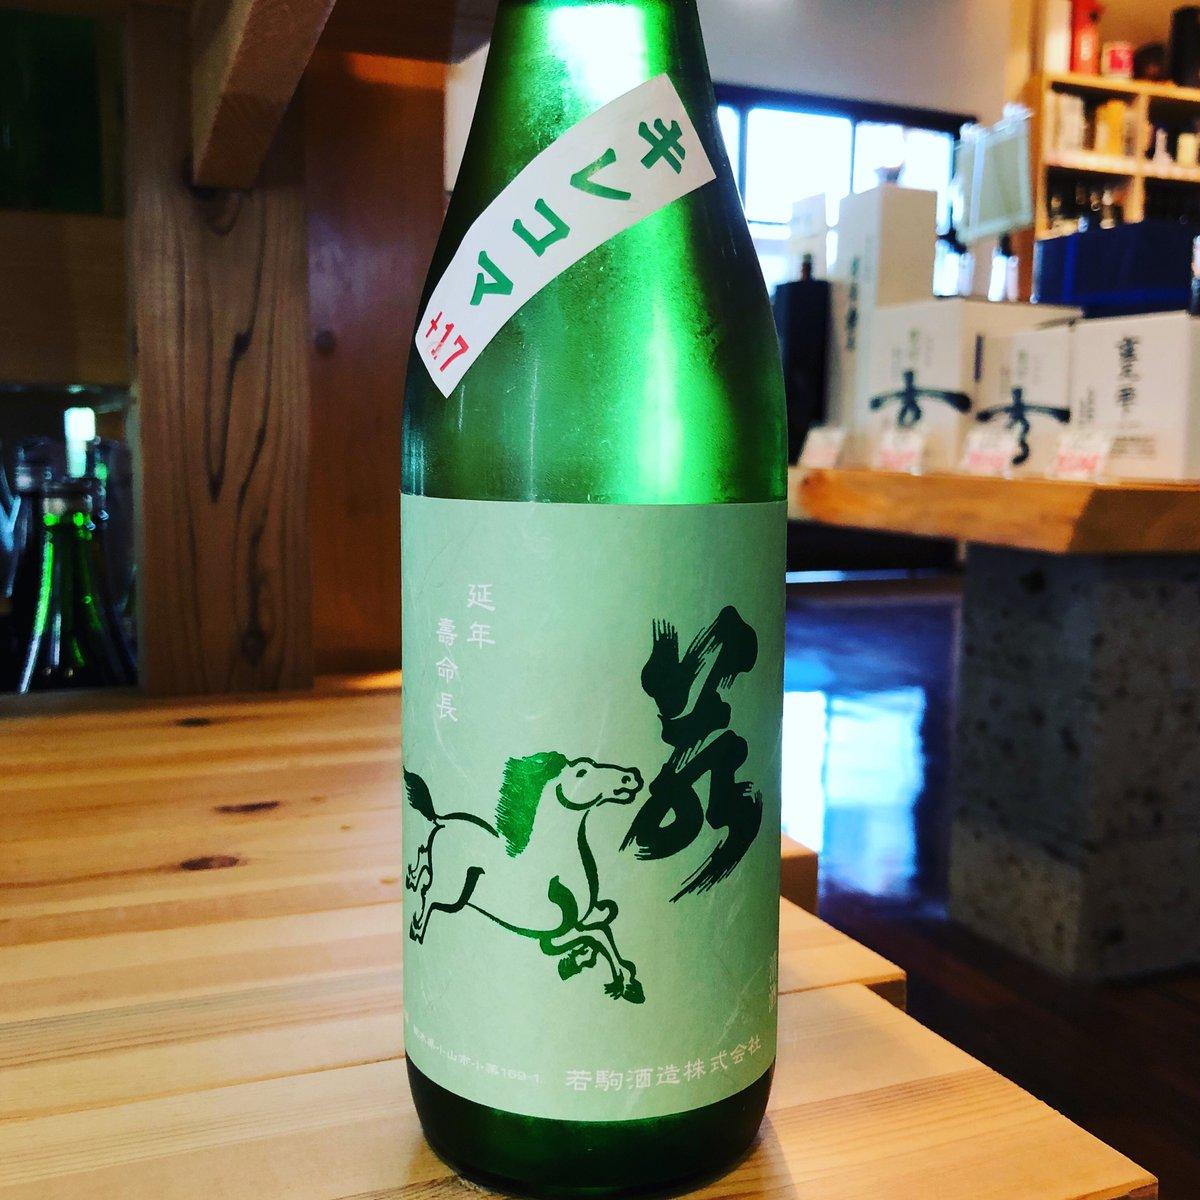 test ツイッターメディア - キレの良さを目指して醸された、栃木県小山市・若駒酒造さんの「キレコマ」です!  #日本酒 #ましだや #栃木県の #シャープでキレの良い日本酒 https://t.co/i0XBcFGyiQ https://t.co/swTXwy95I9